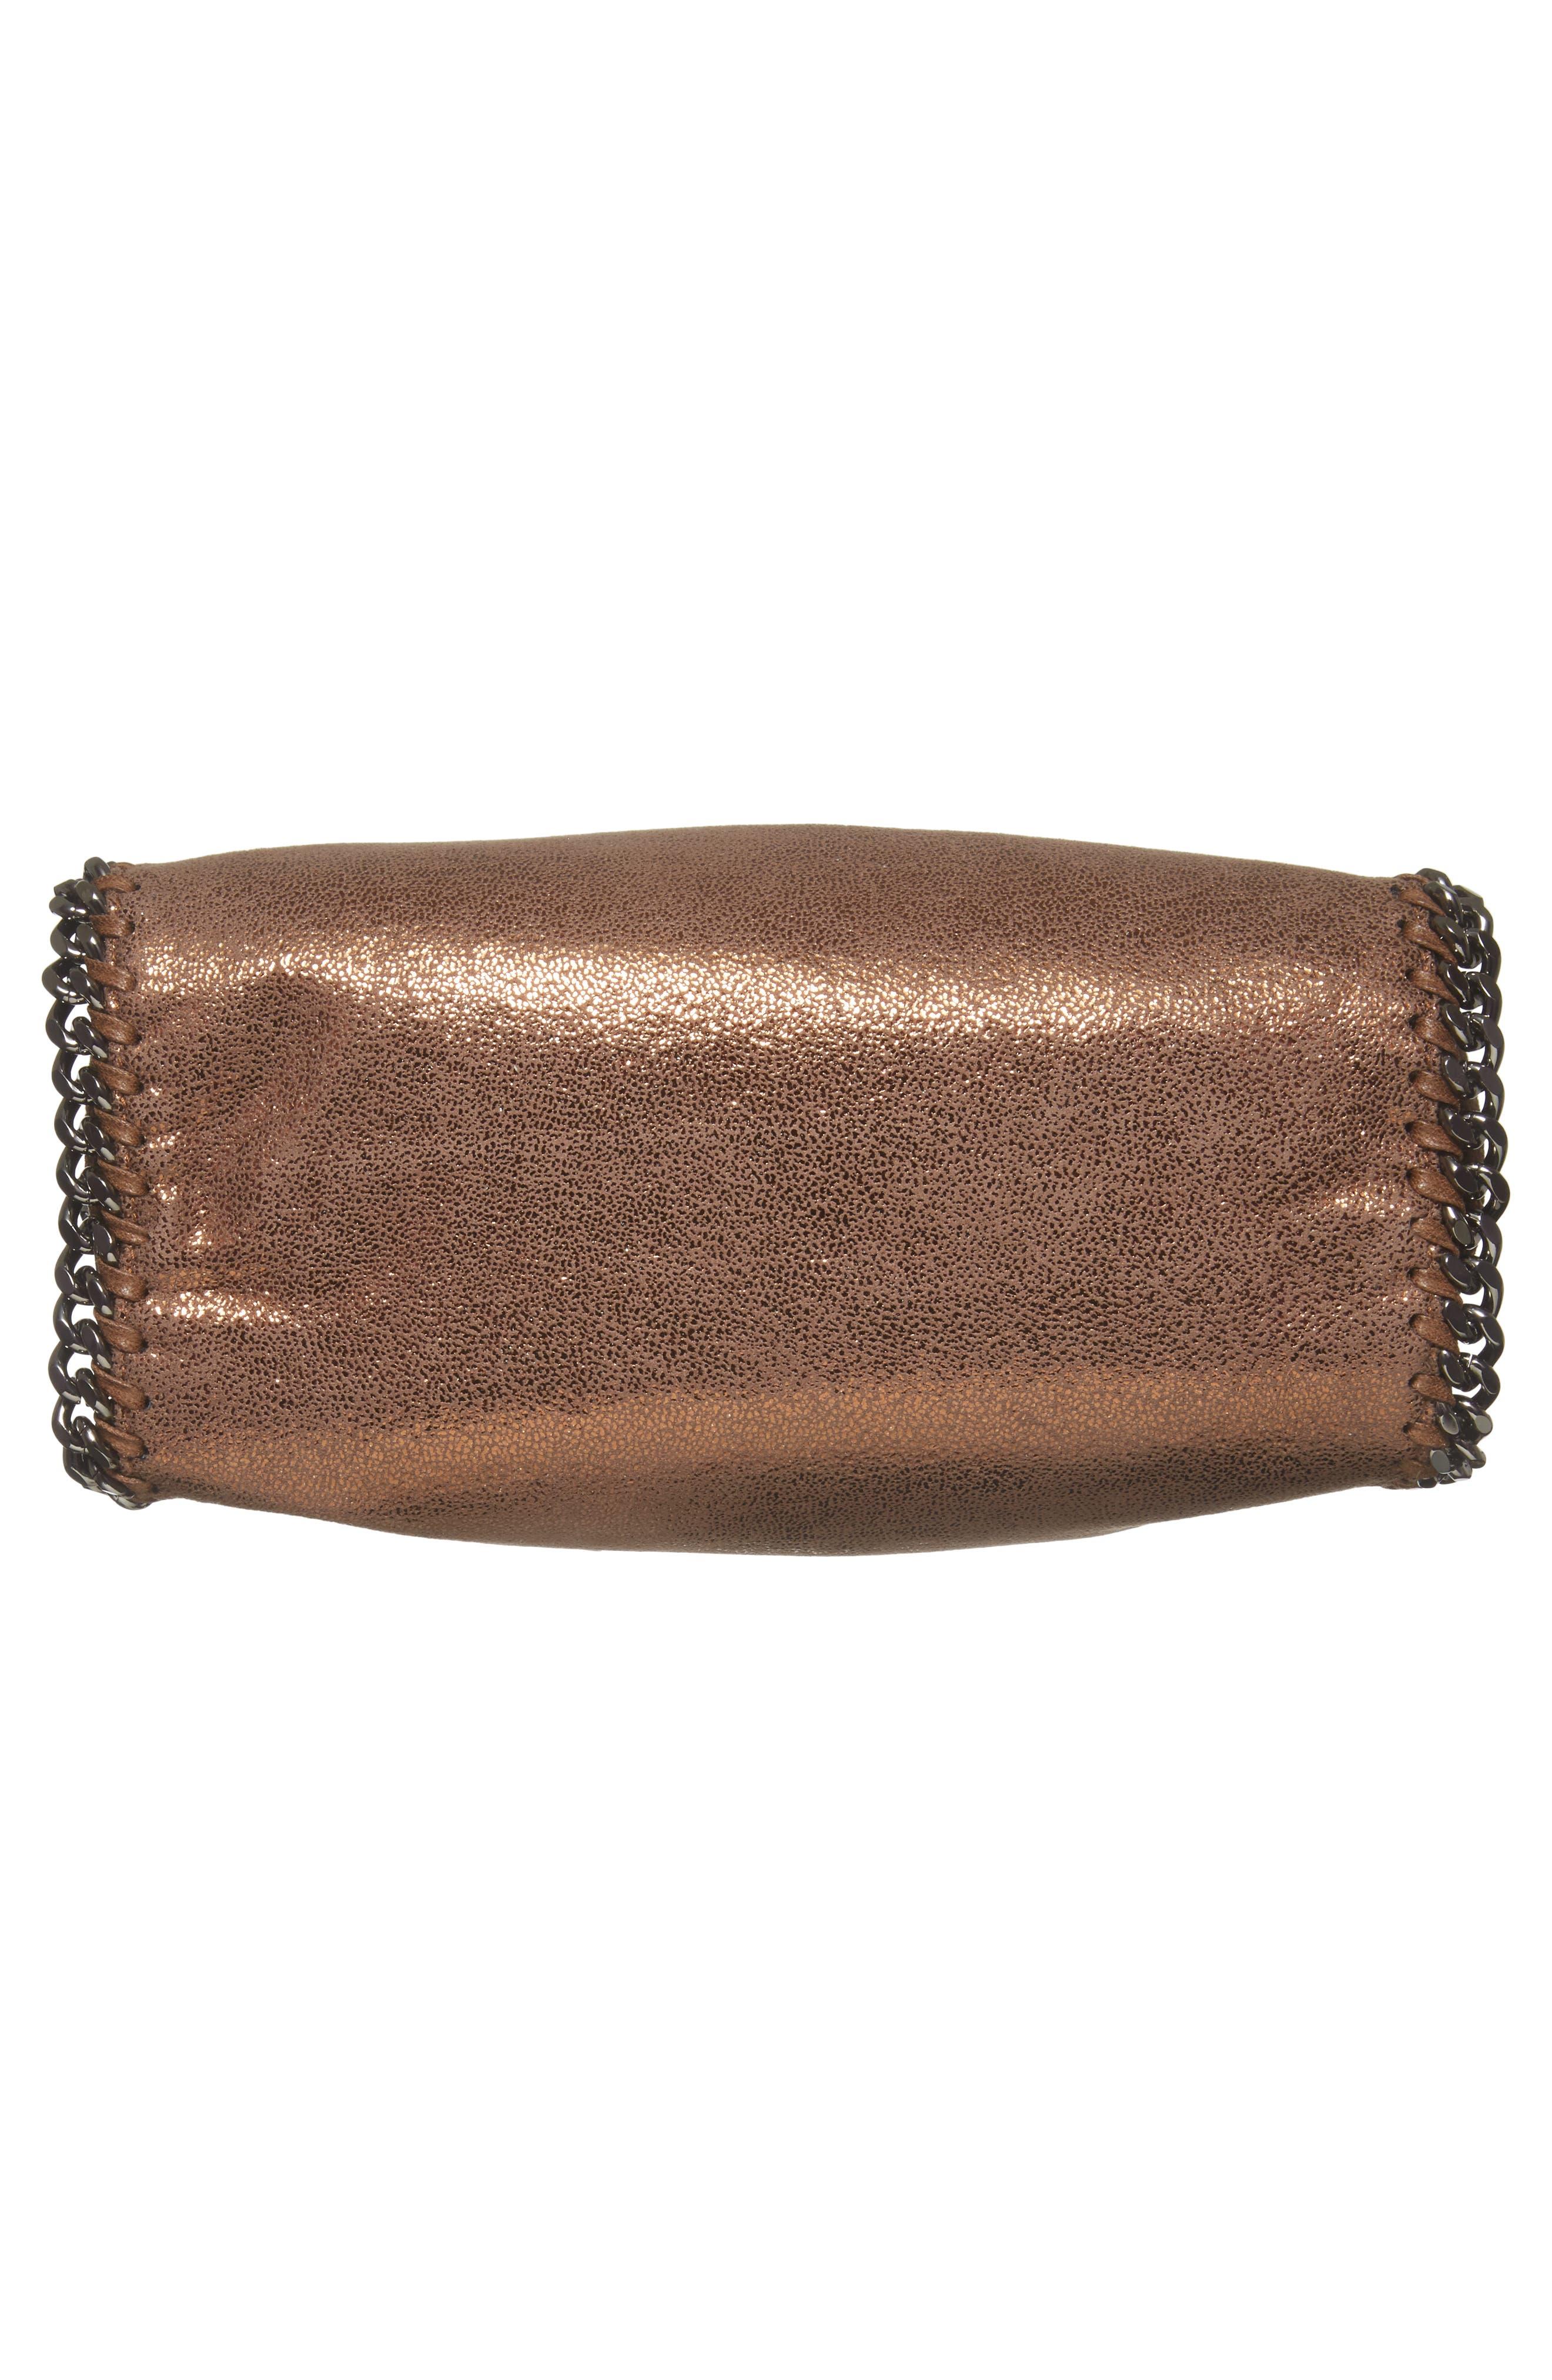 Mini Falabella Shaggy Deer Metallic Faux Leather Tote,                             Alternate thumbnail 6, color,                             200